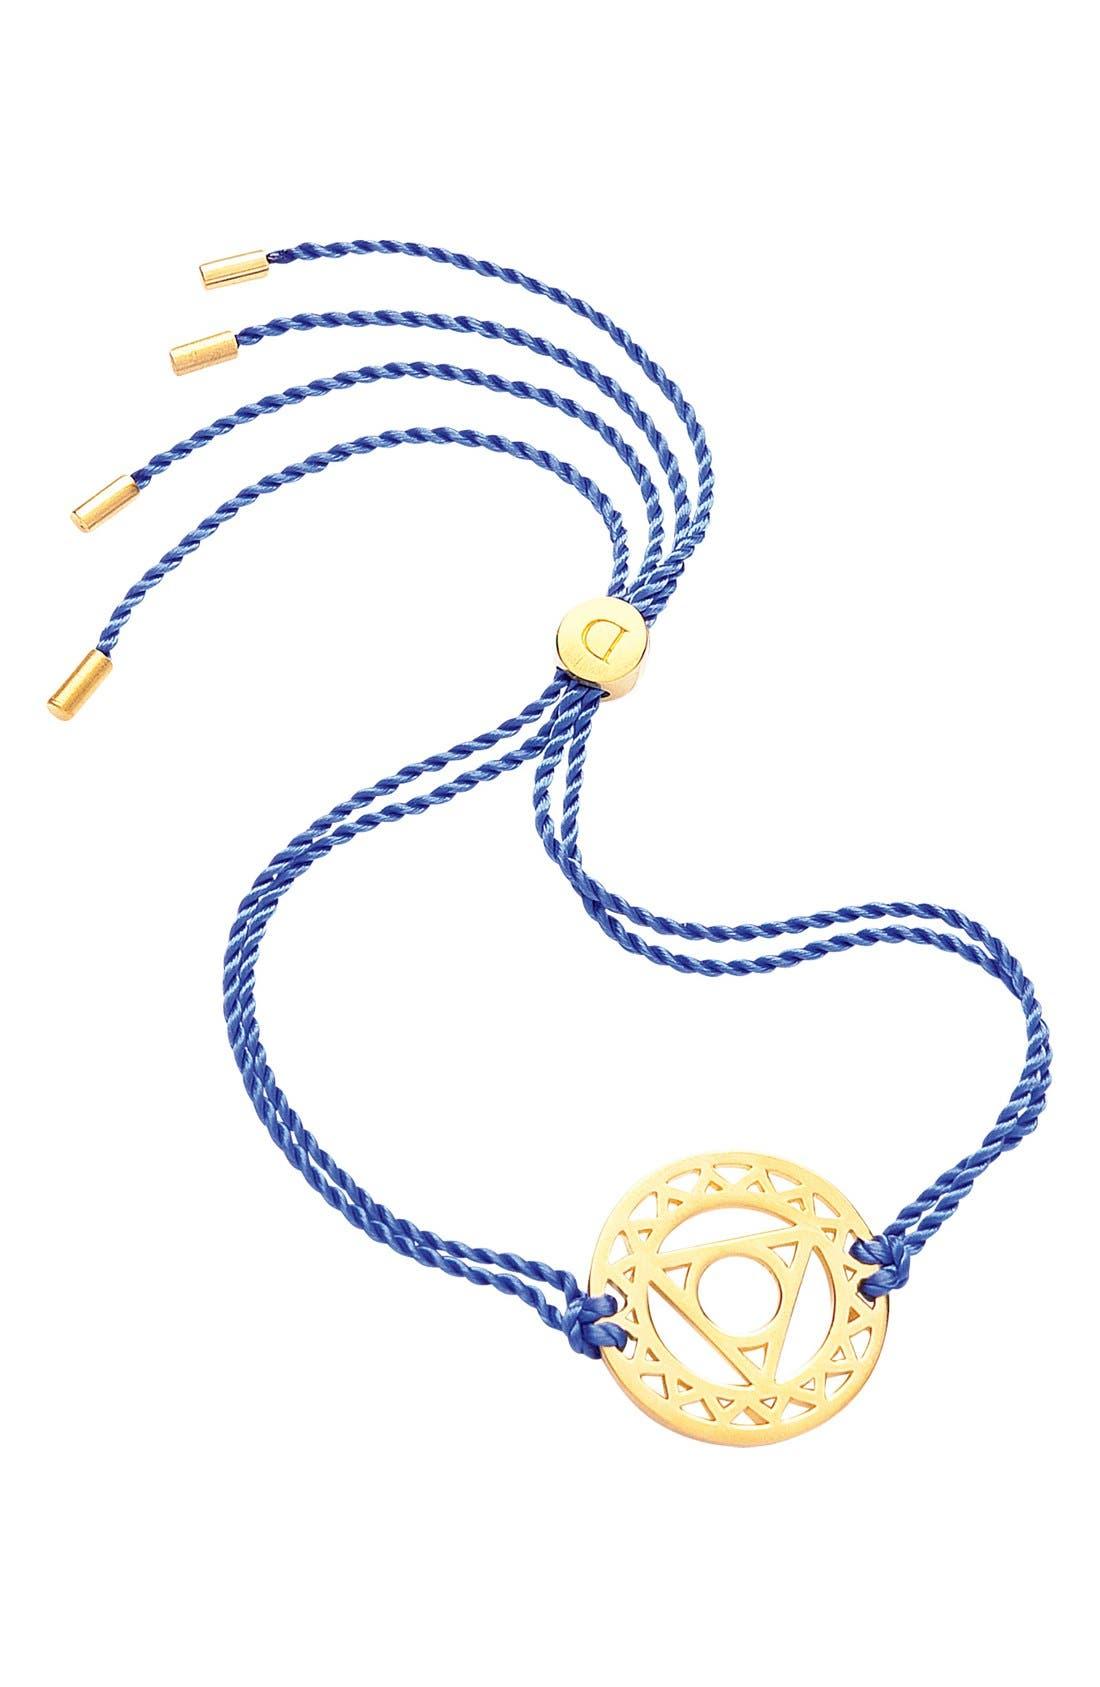 DAISY LONDON 'Throat Chakra' Cord Bracelet